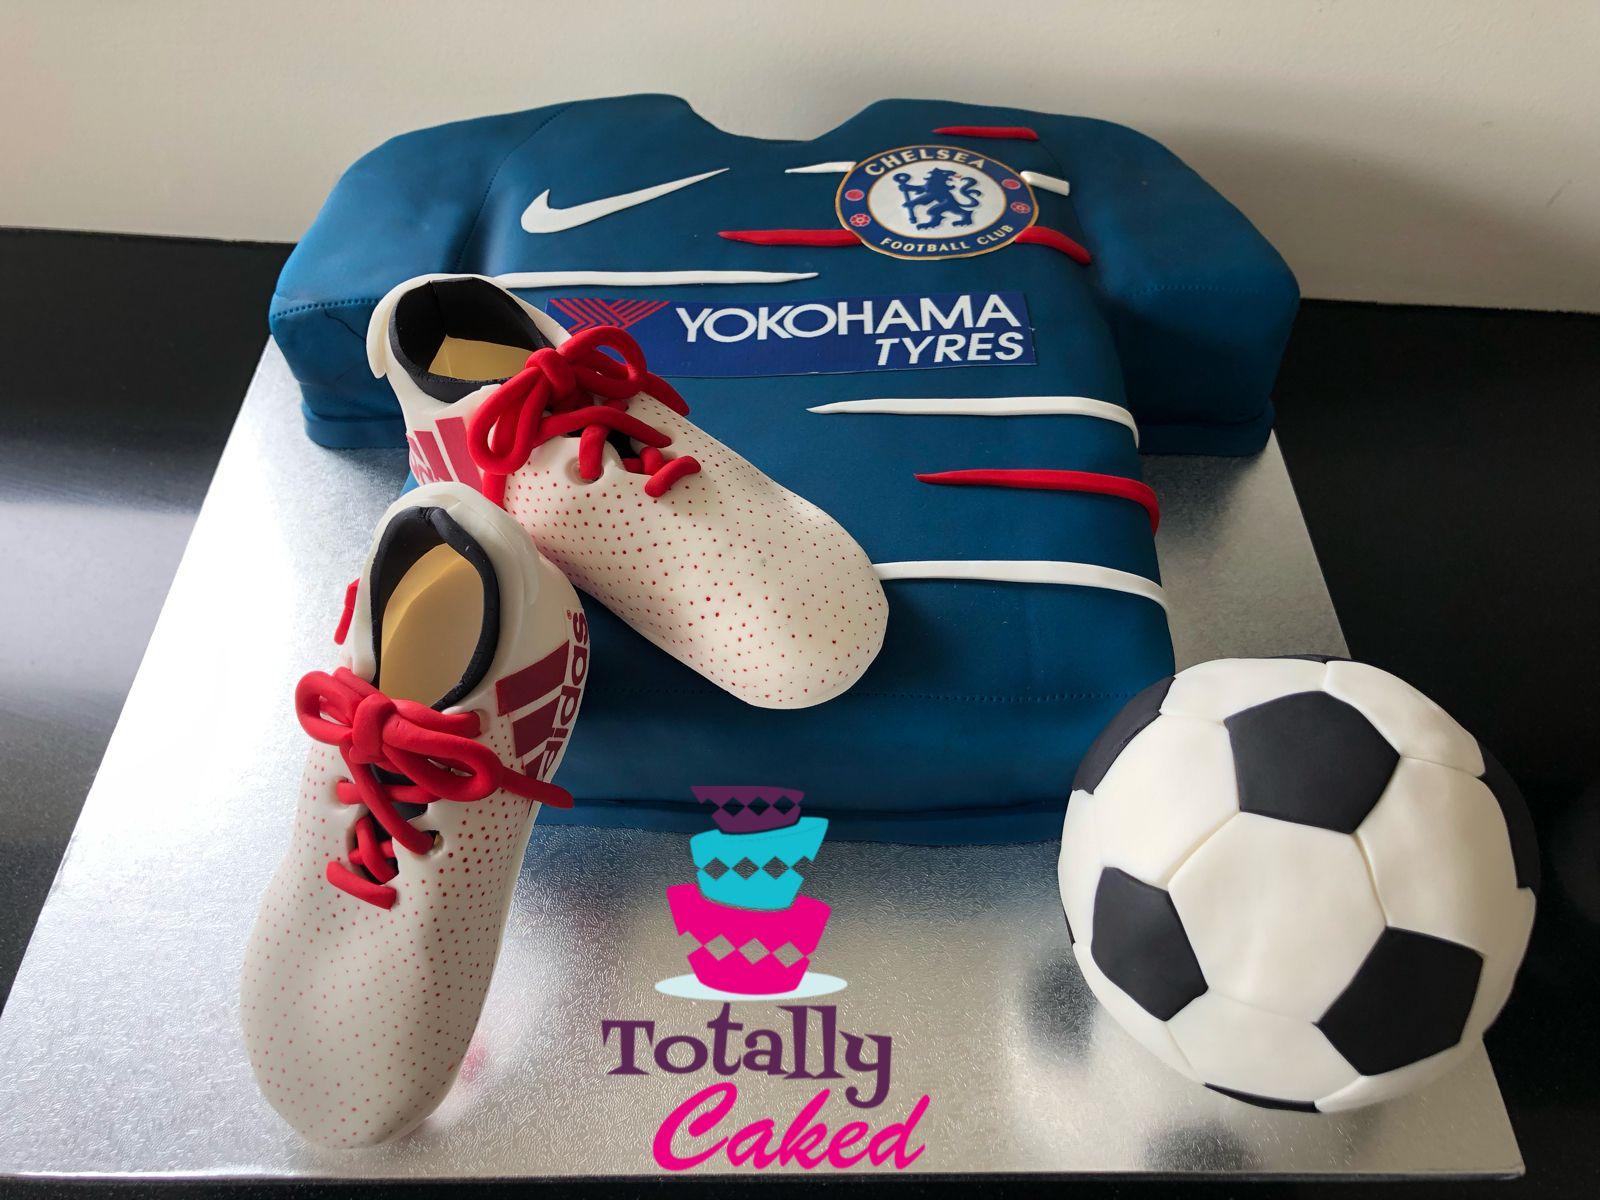 Chelsea football shirt cake and adidas fondant football